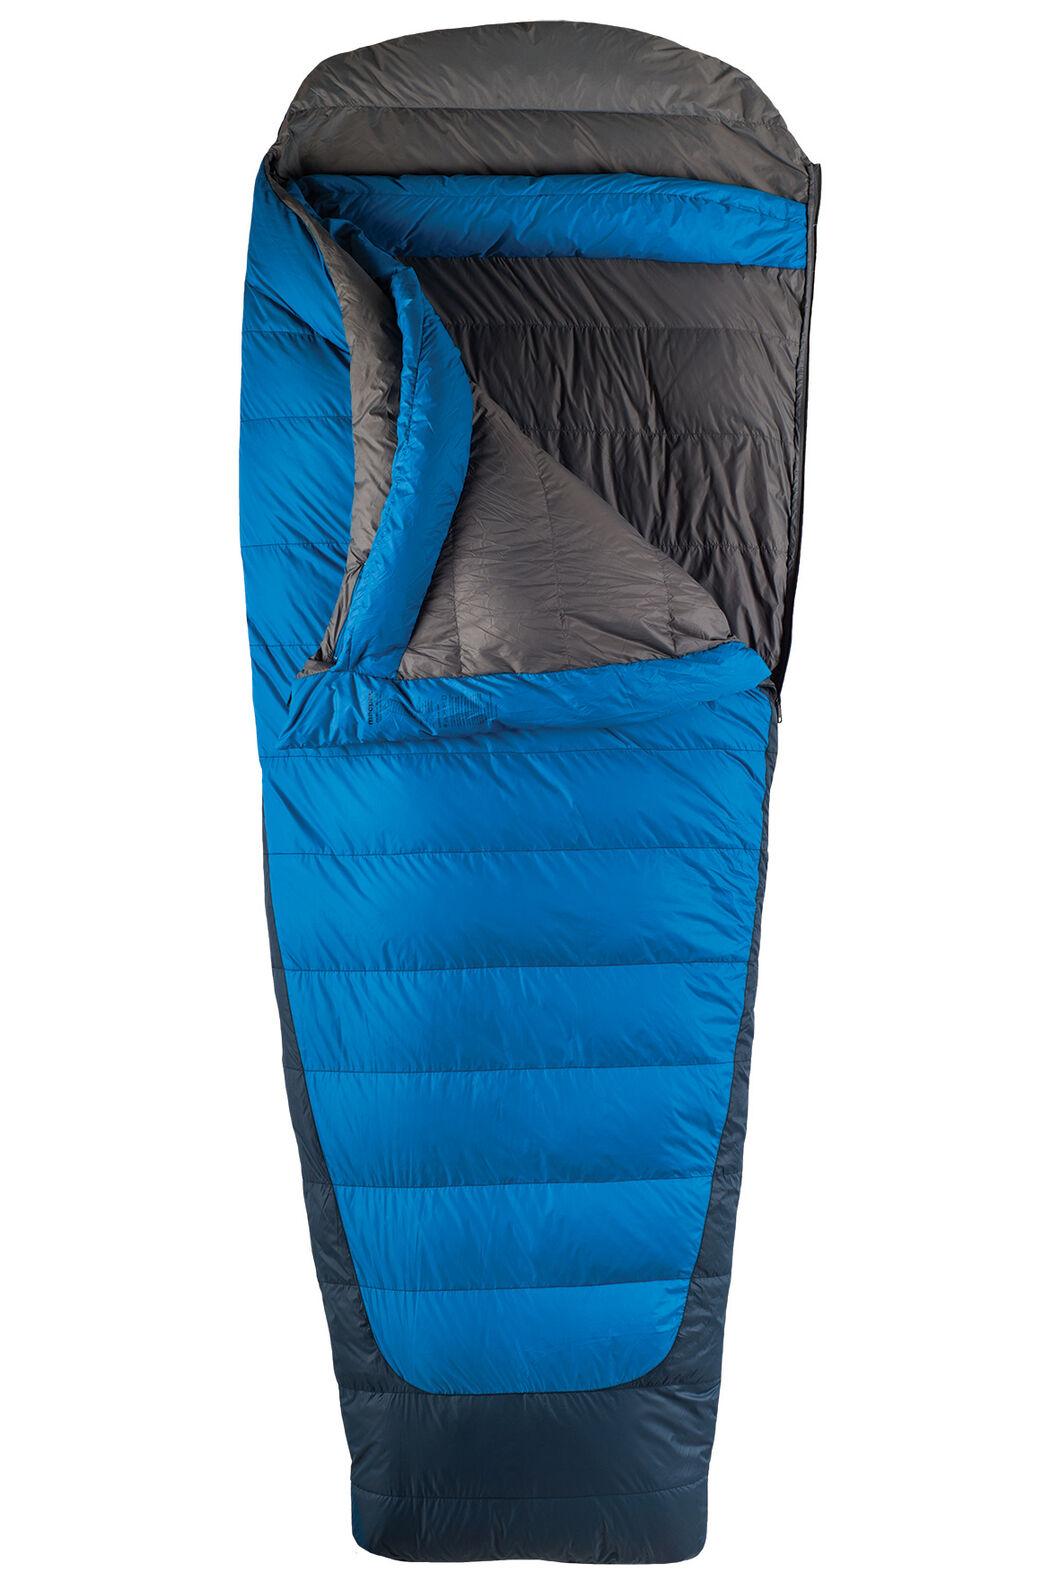 Escapade Down 700 Sleeping Bag - Extra Large, Classic Blue, hi-res